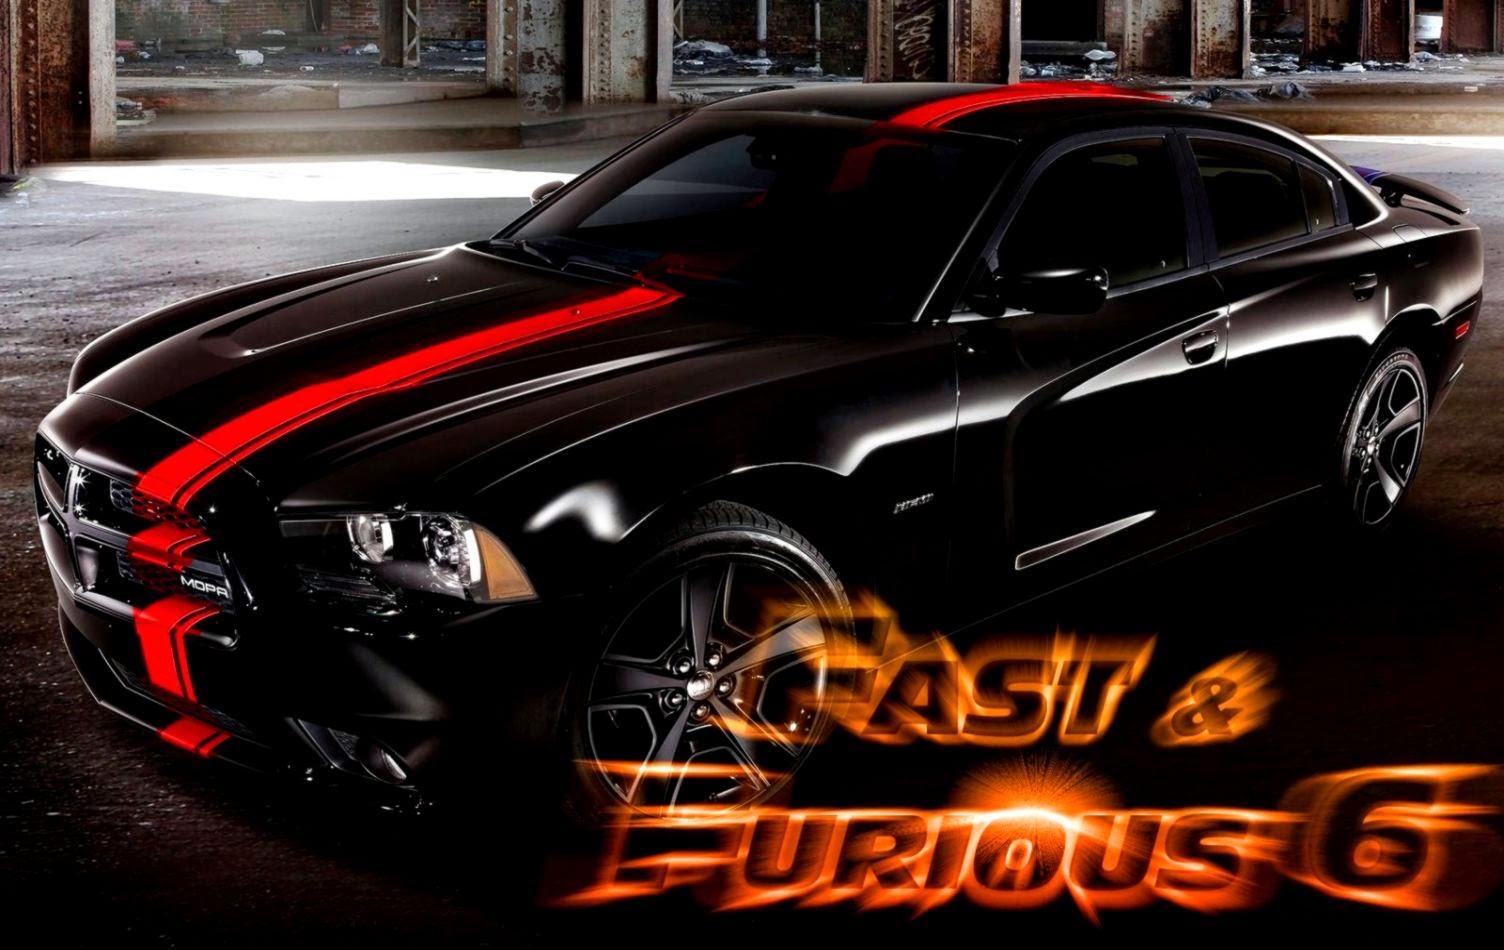 fast and furious 6 black cars mega wallpapers. Black Bedroom Furniture Sets. Home Design Ideas